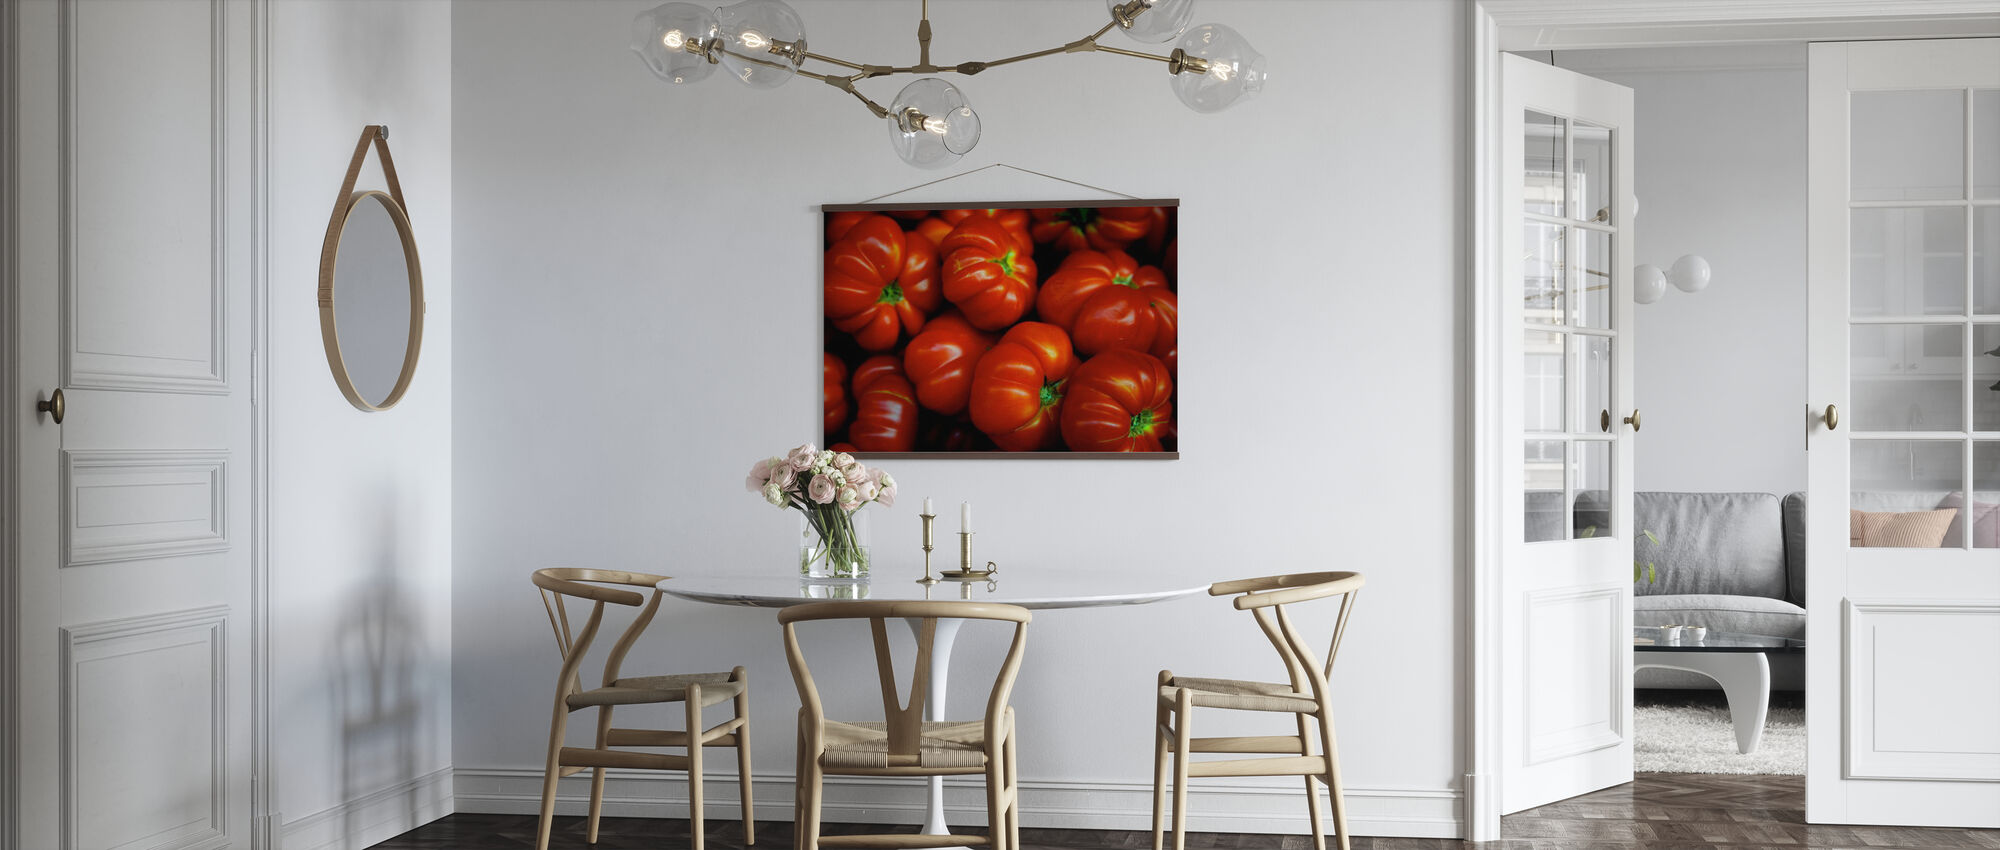 Pomodori Italiani - Poster - Cucina